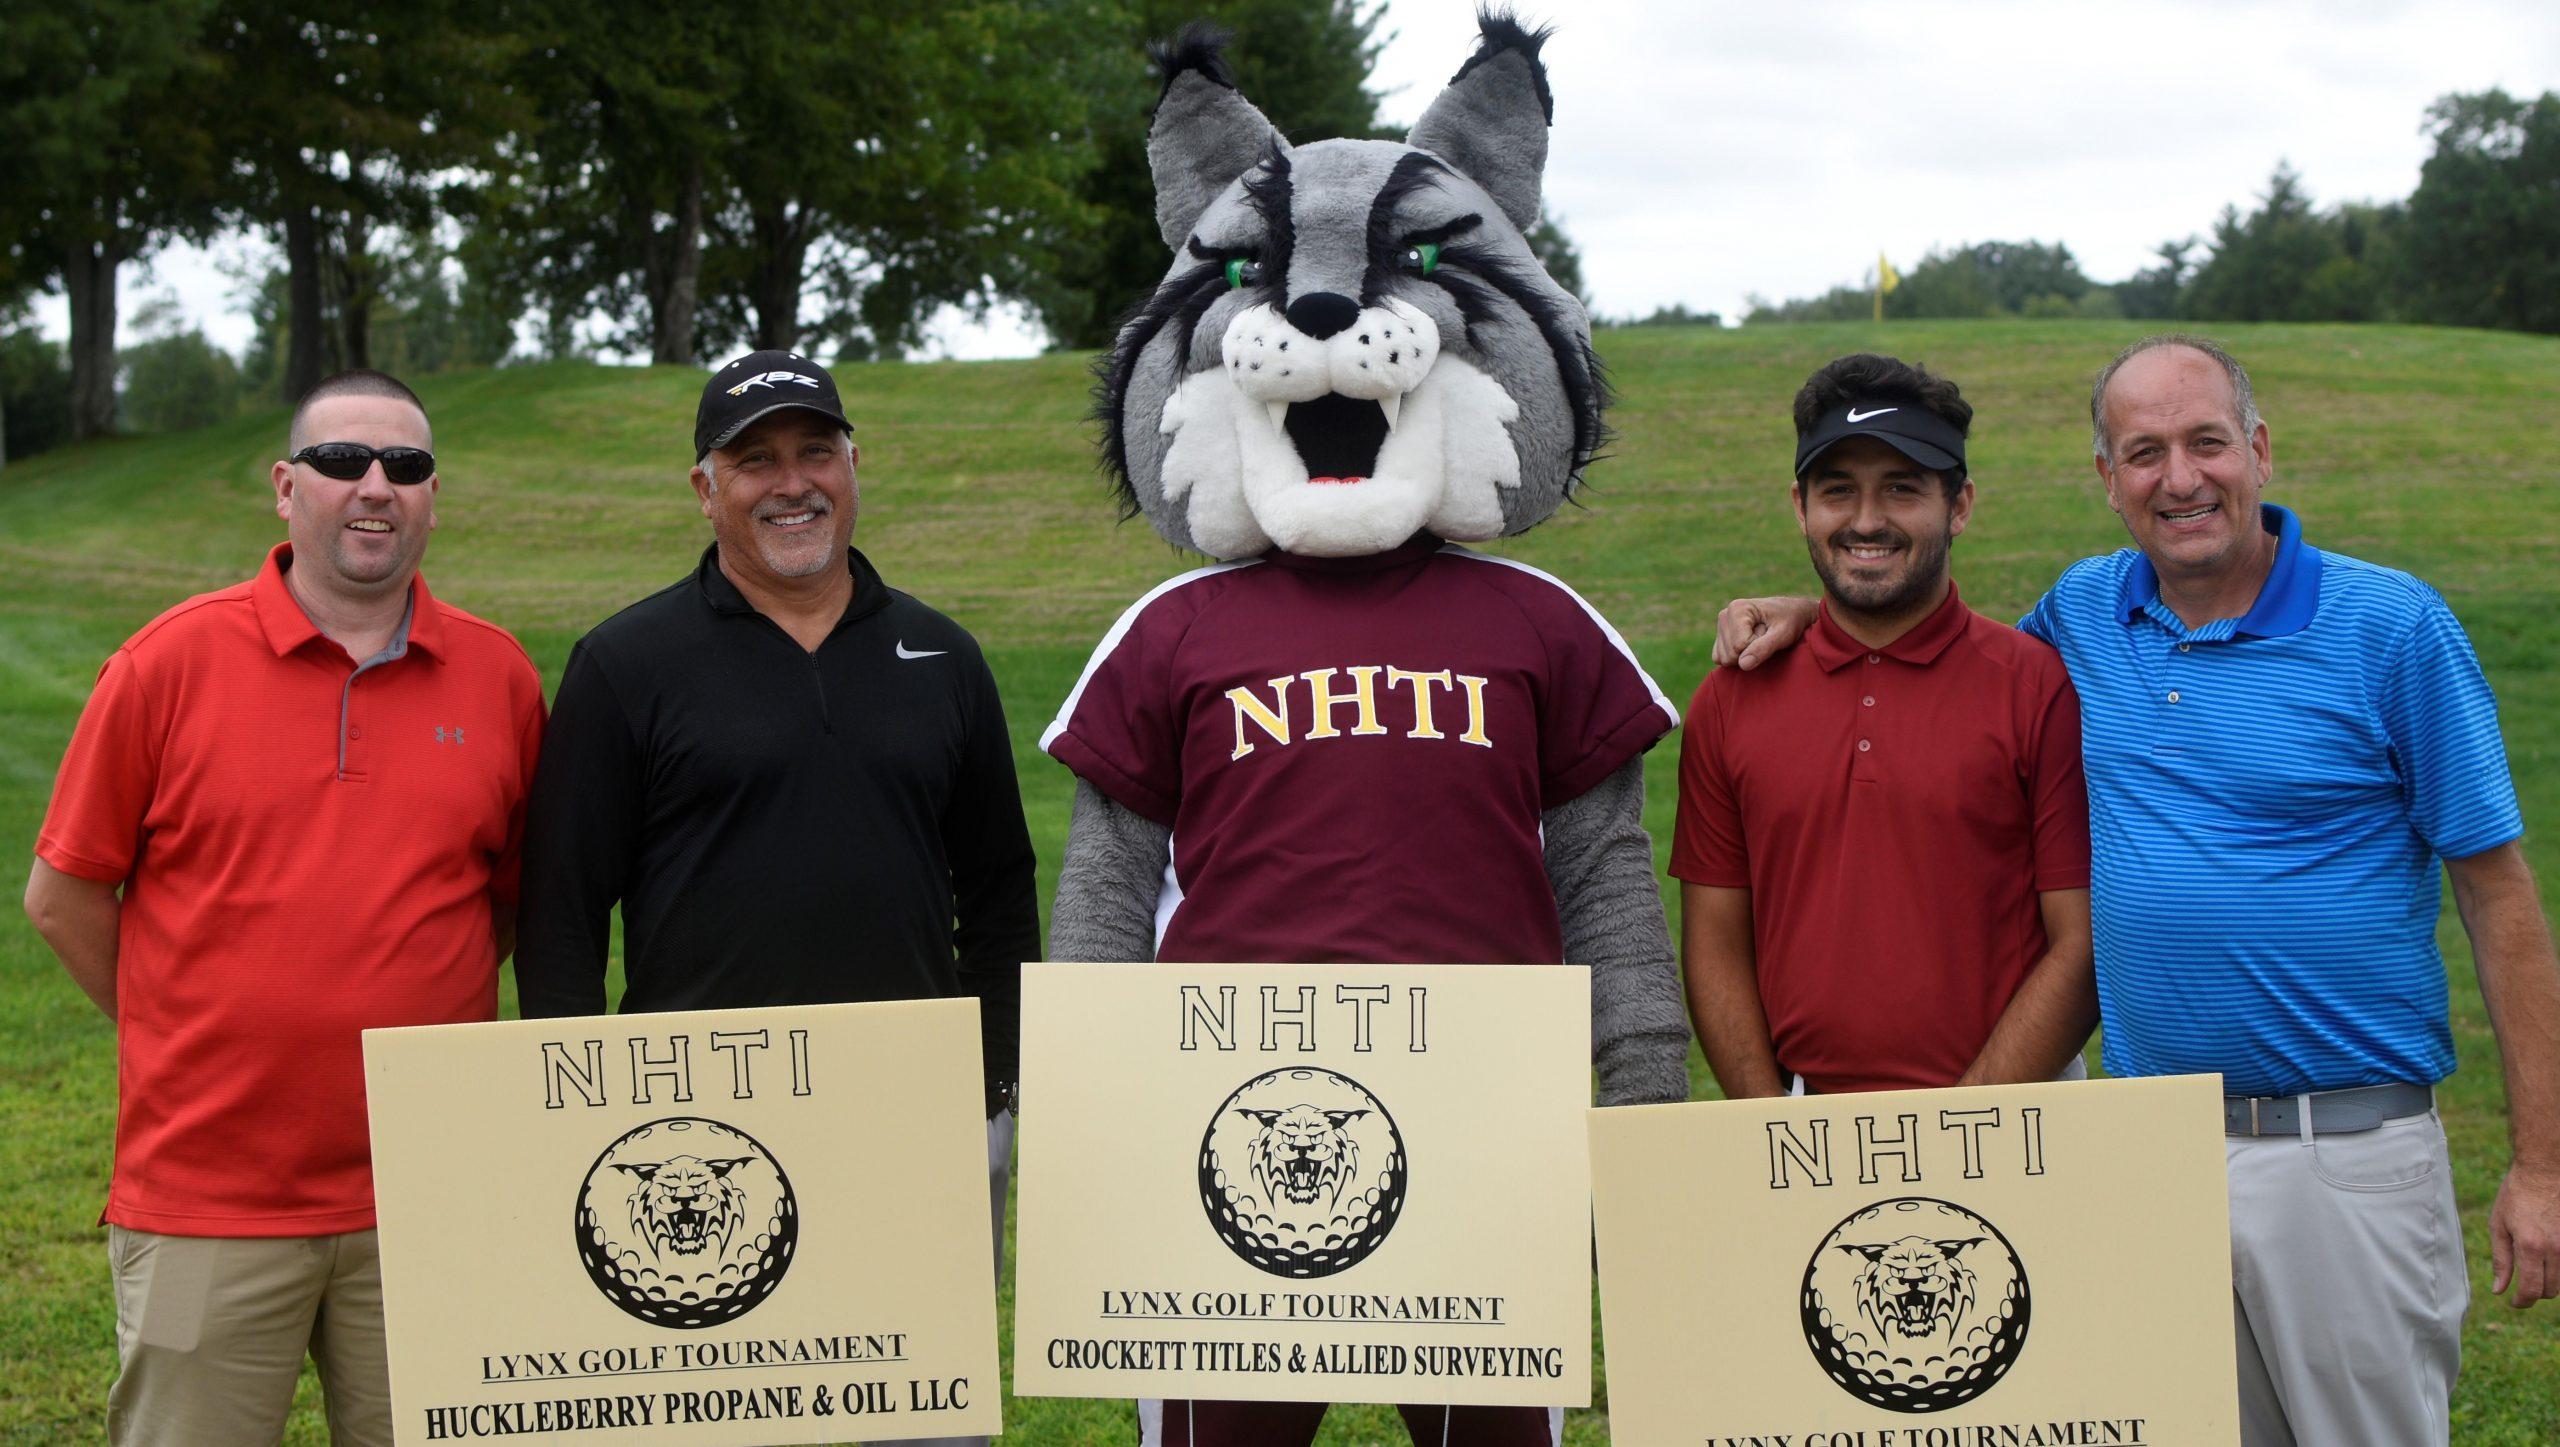 NHTI Lynx Golf Series @ Beaver Meadow Golf Course - June 7, 2021